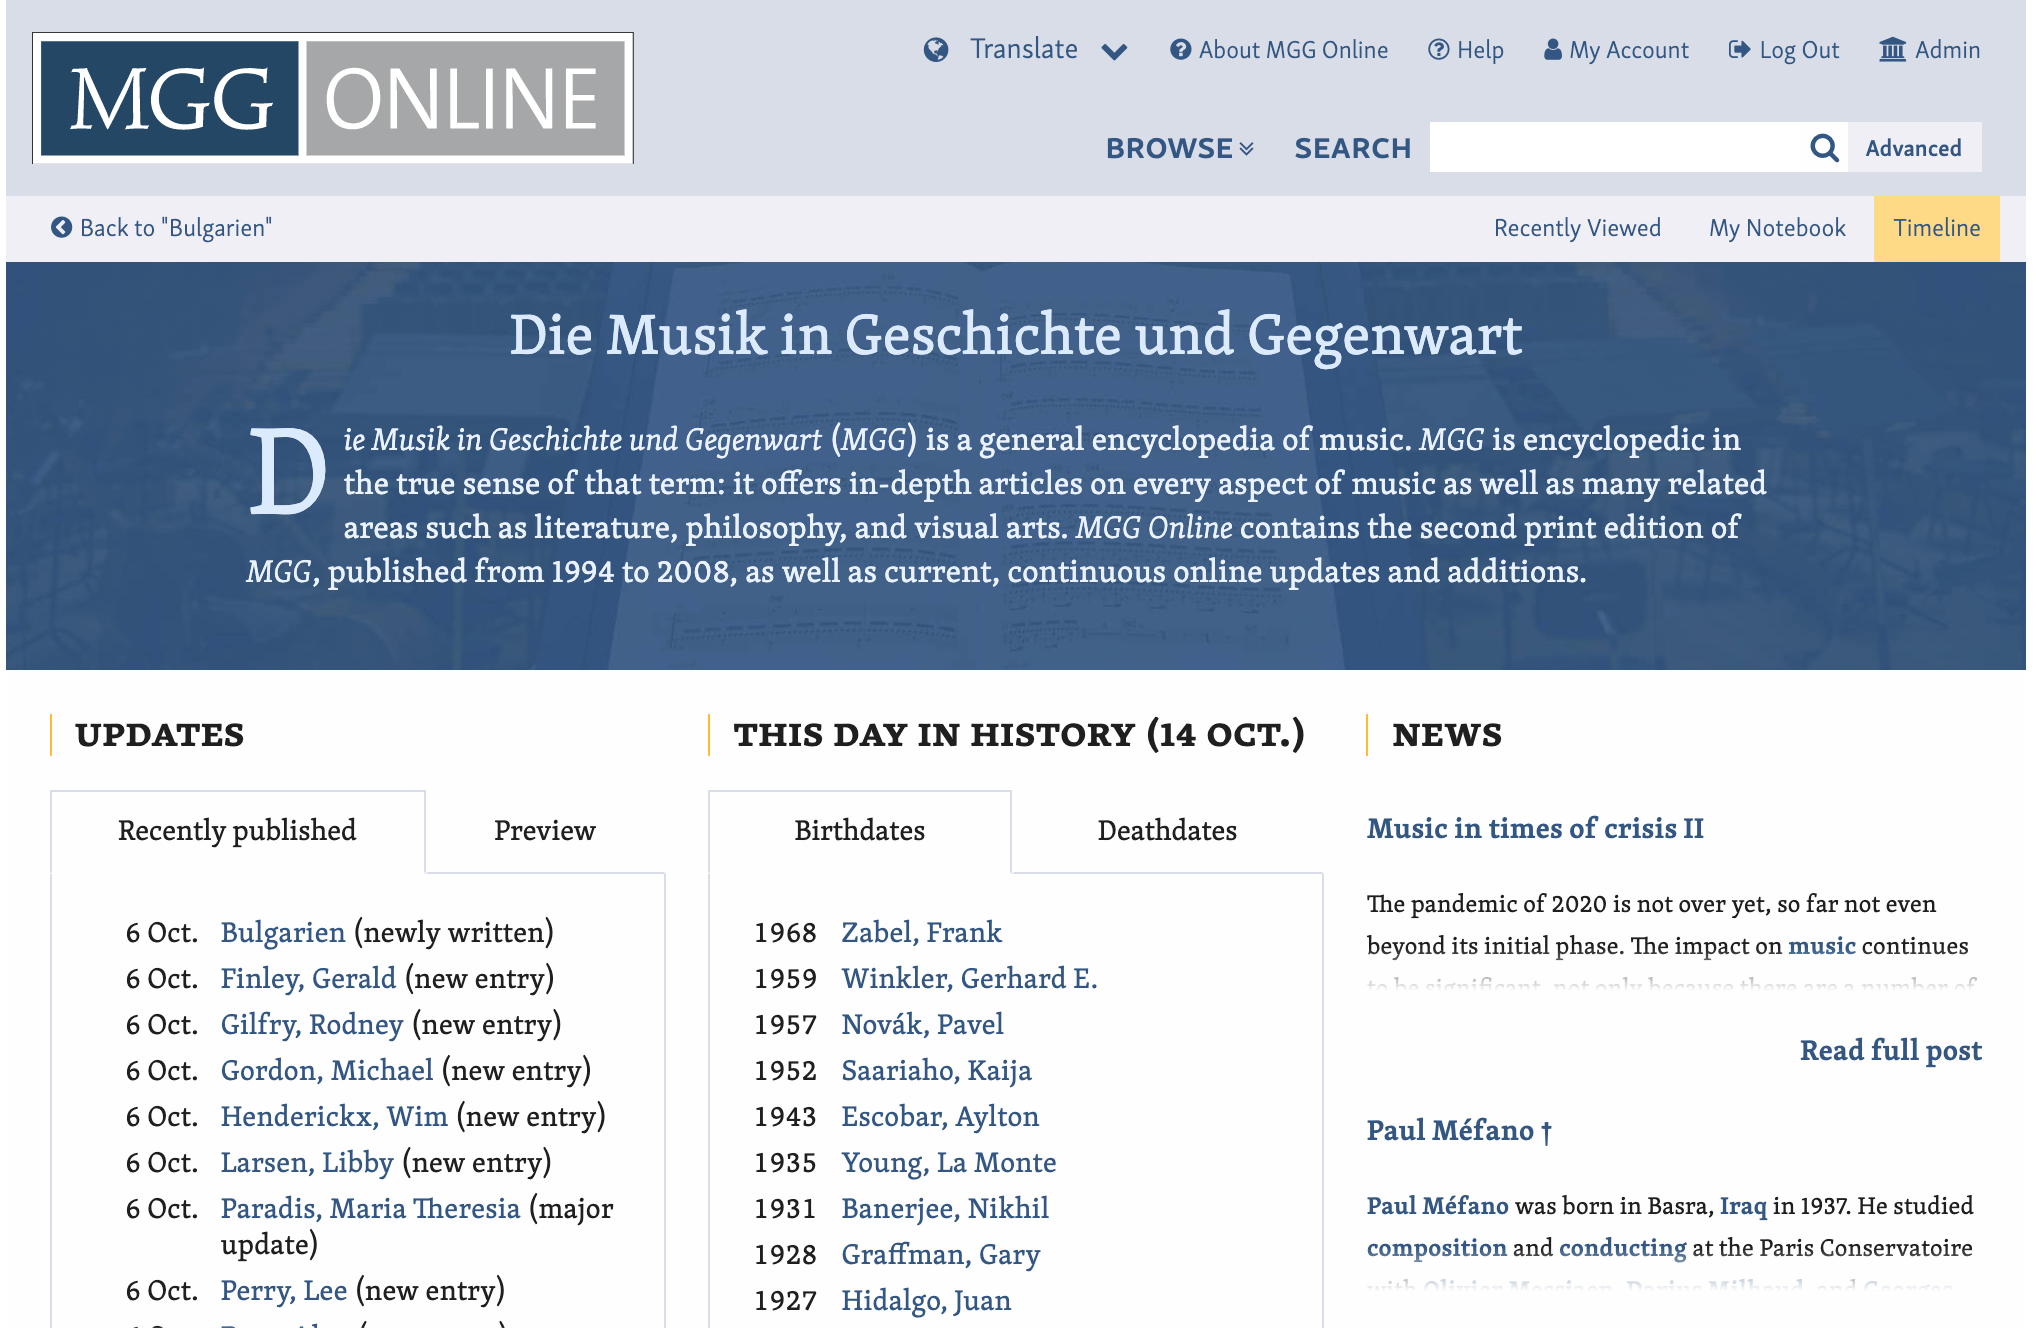 screen shot of mgg online website homepage